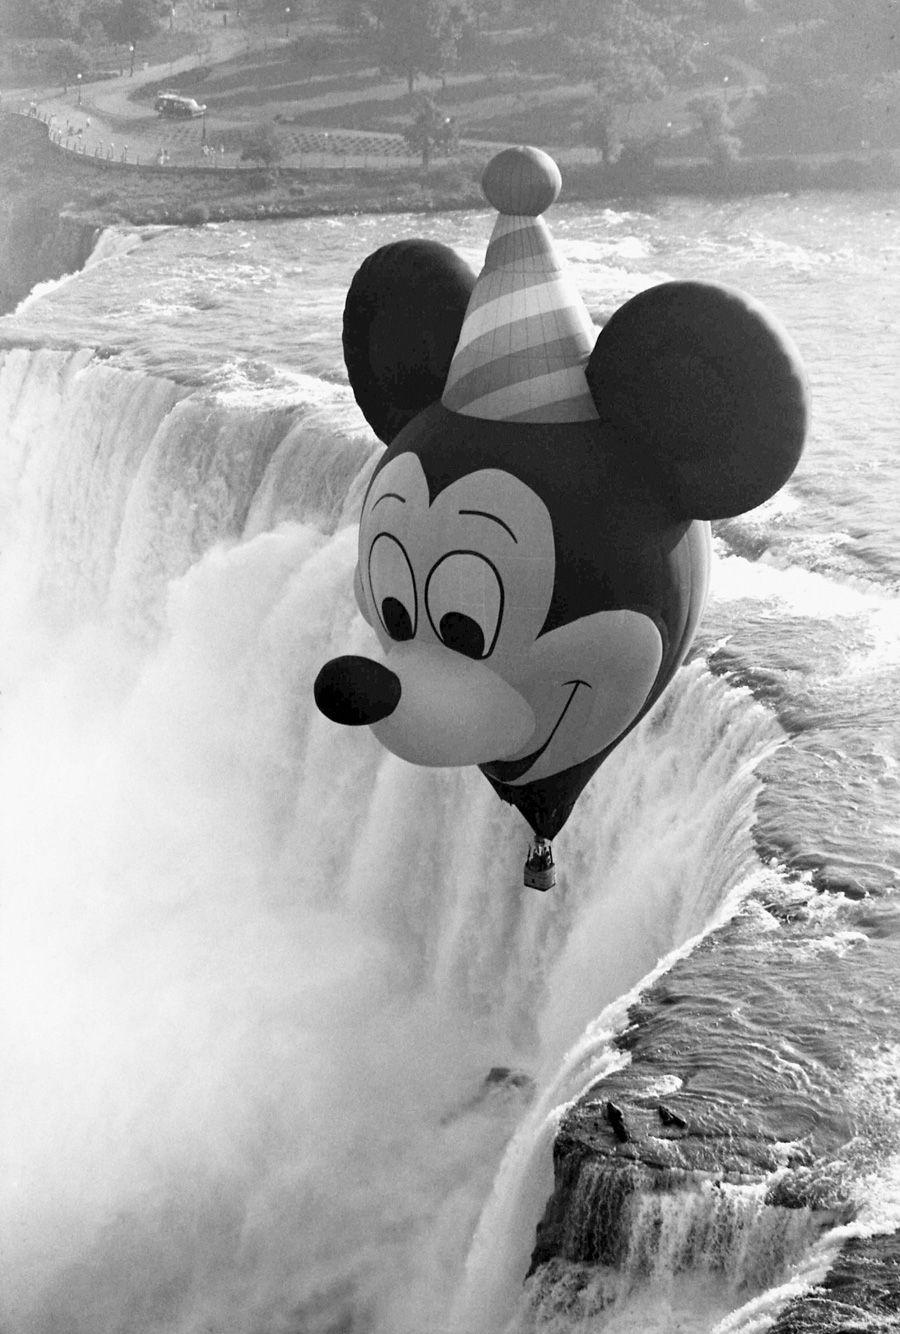 Gene Duncan - Mickey's 60th BIrhtday Celebration, 1988. A brand new hot air balloon flies over the Niagara Falls. S)